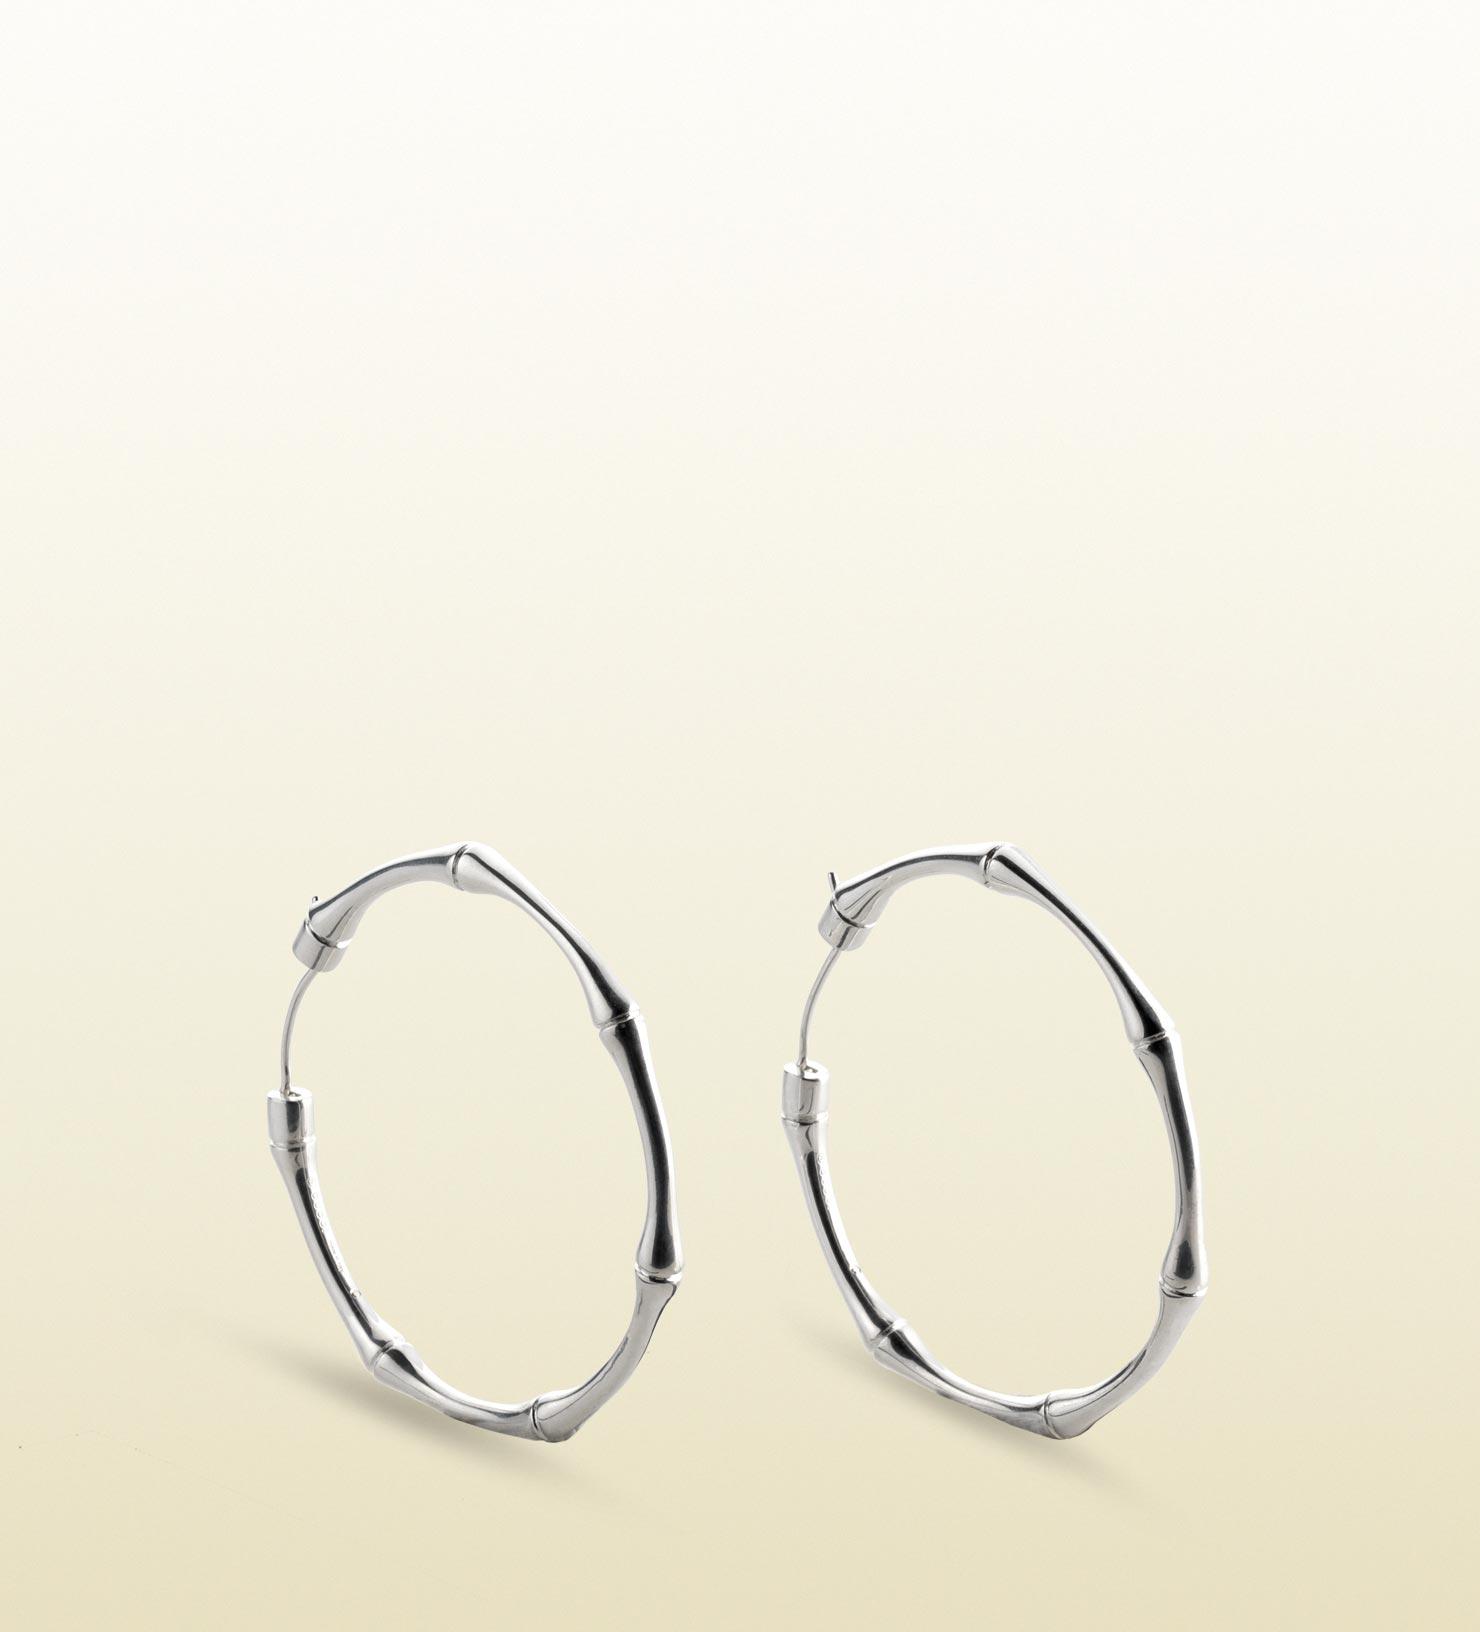 518eebb7a Gucci Silver Bamboo Hoop Earrings in Metallic - Lyst